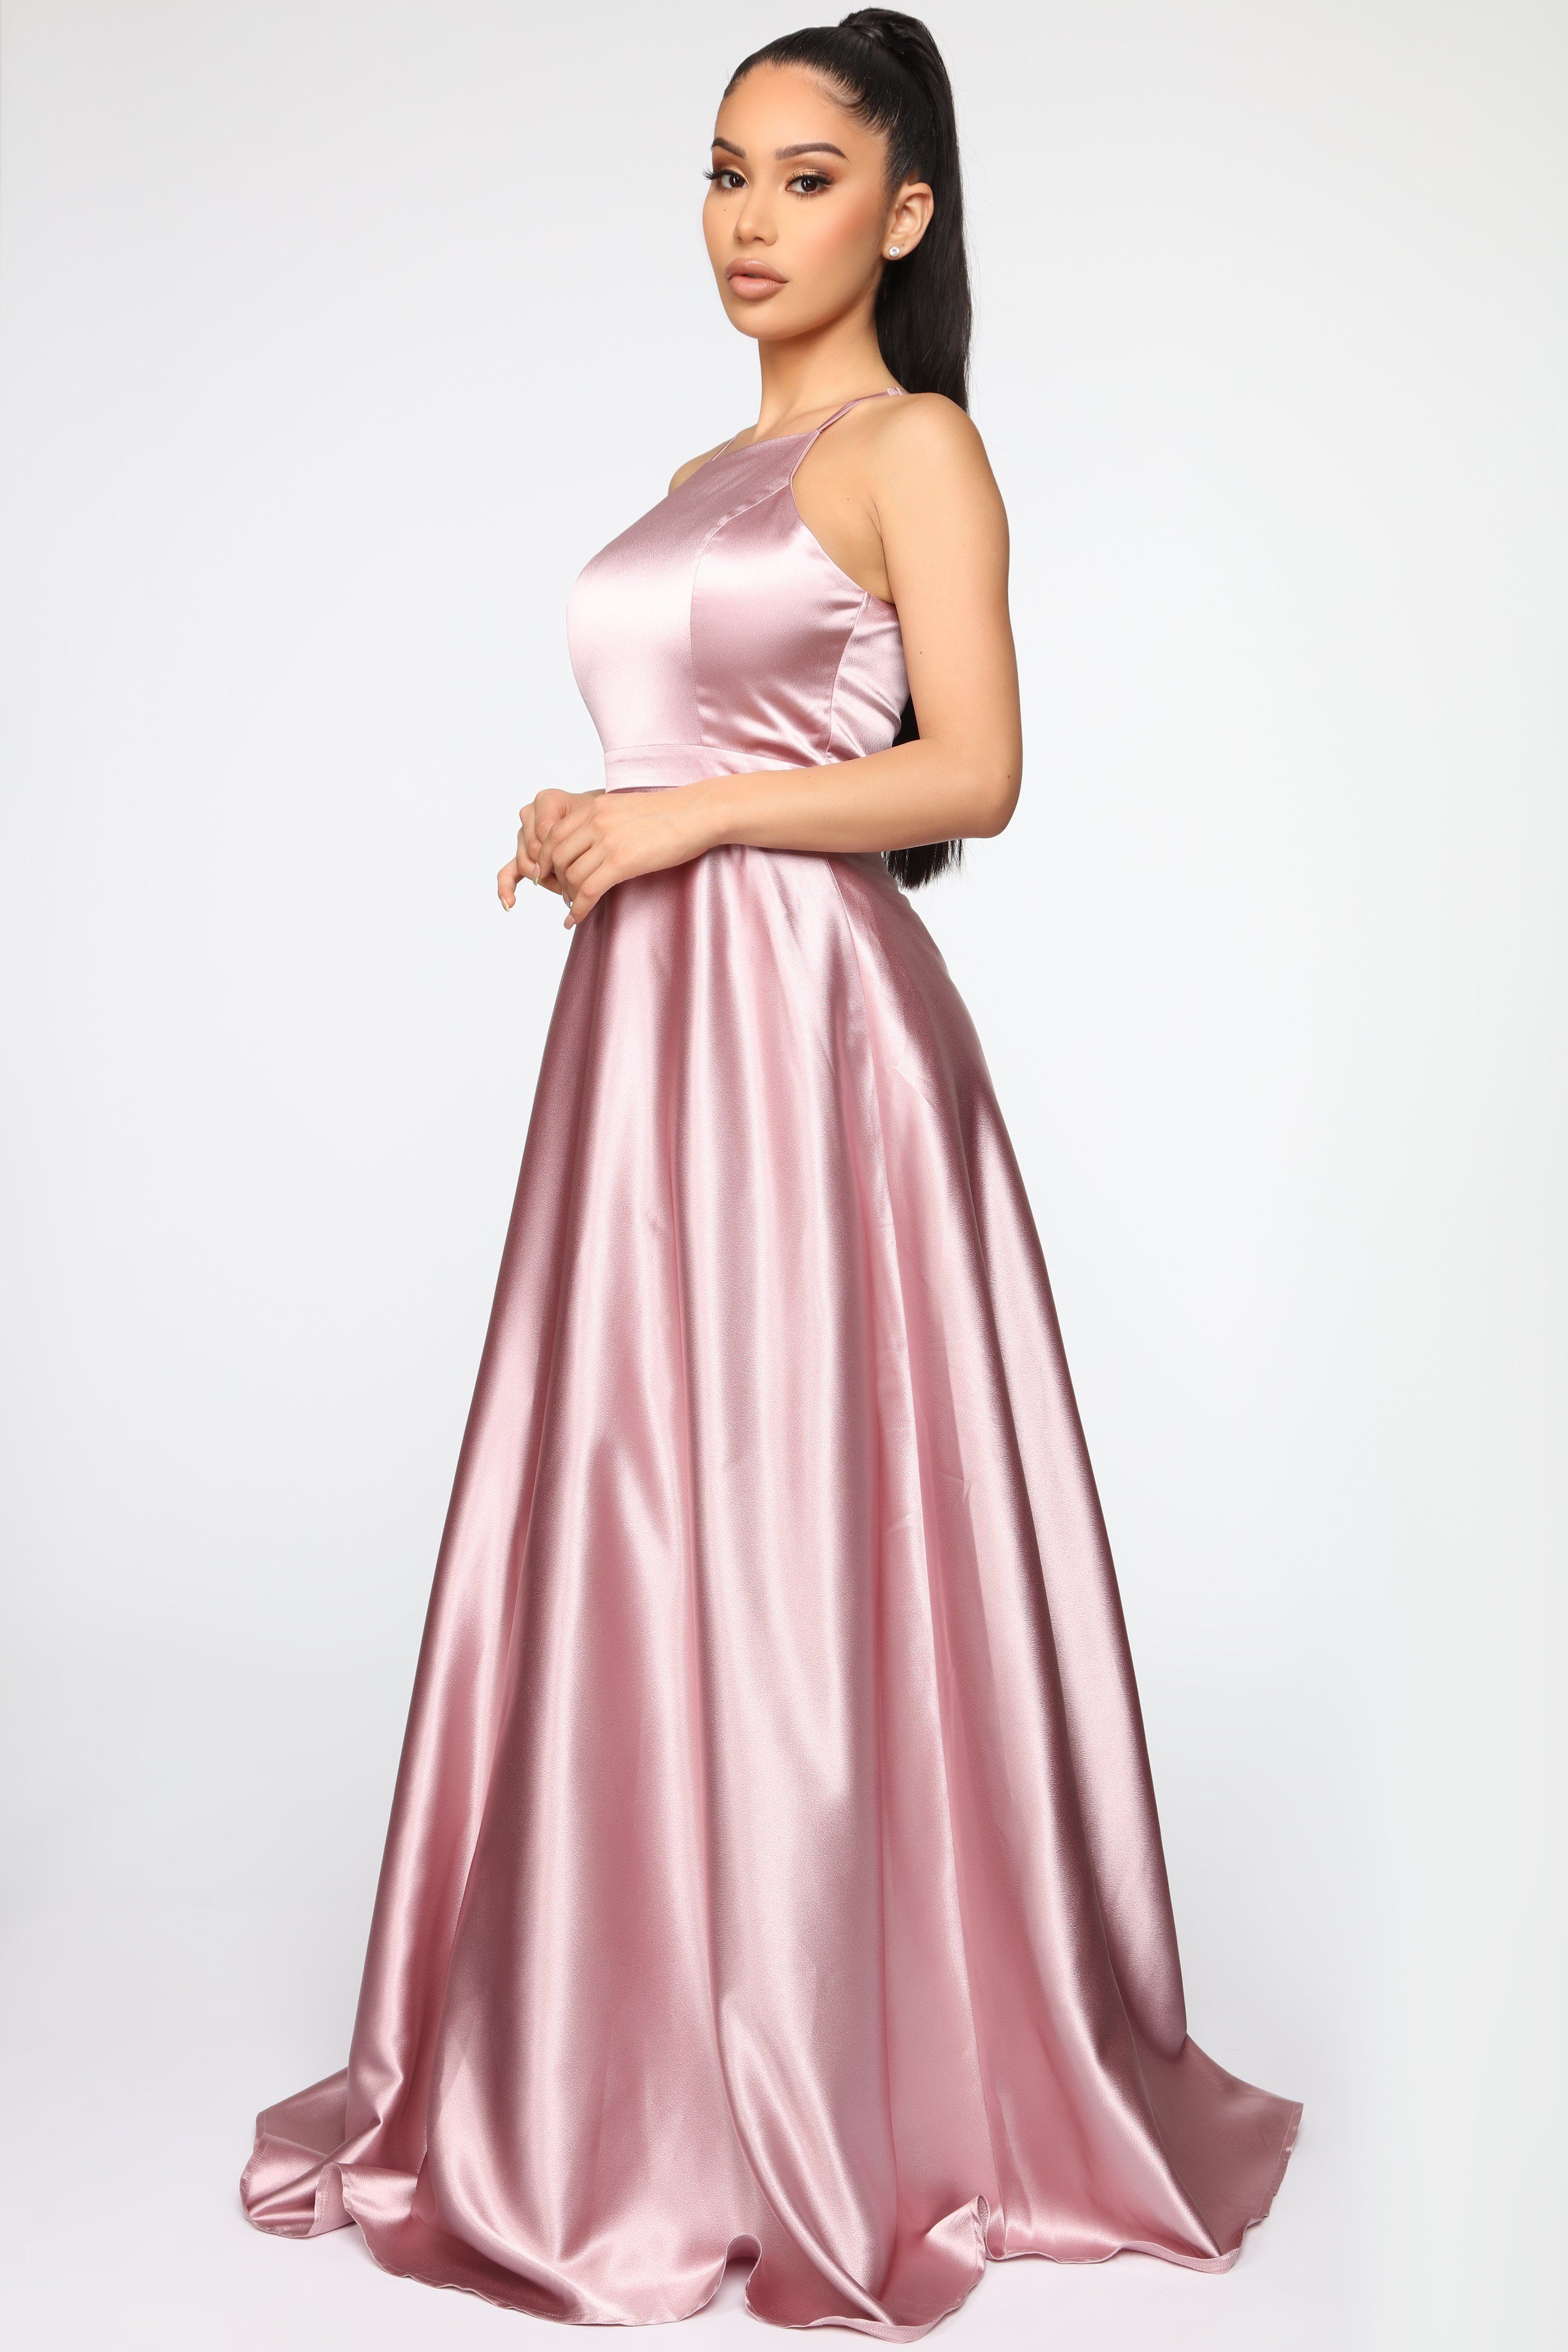 Fascinating Satin Dress Mauve in 2020 Satin dresses